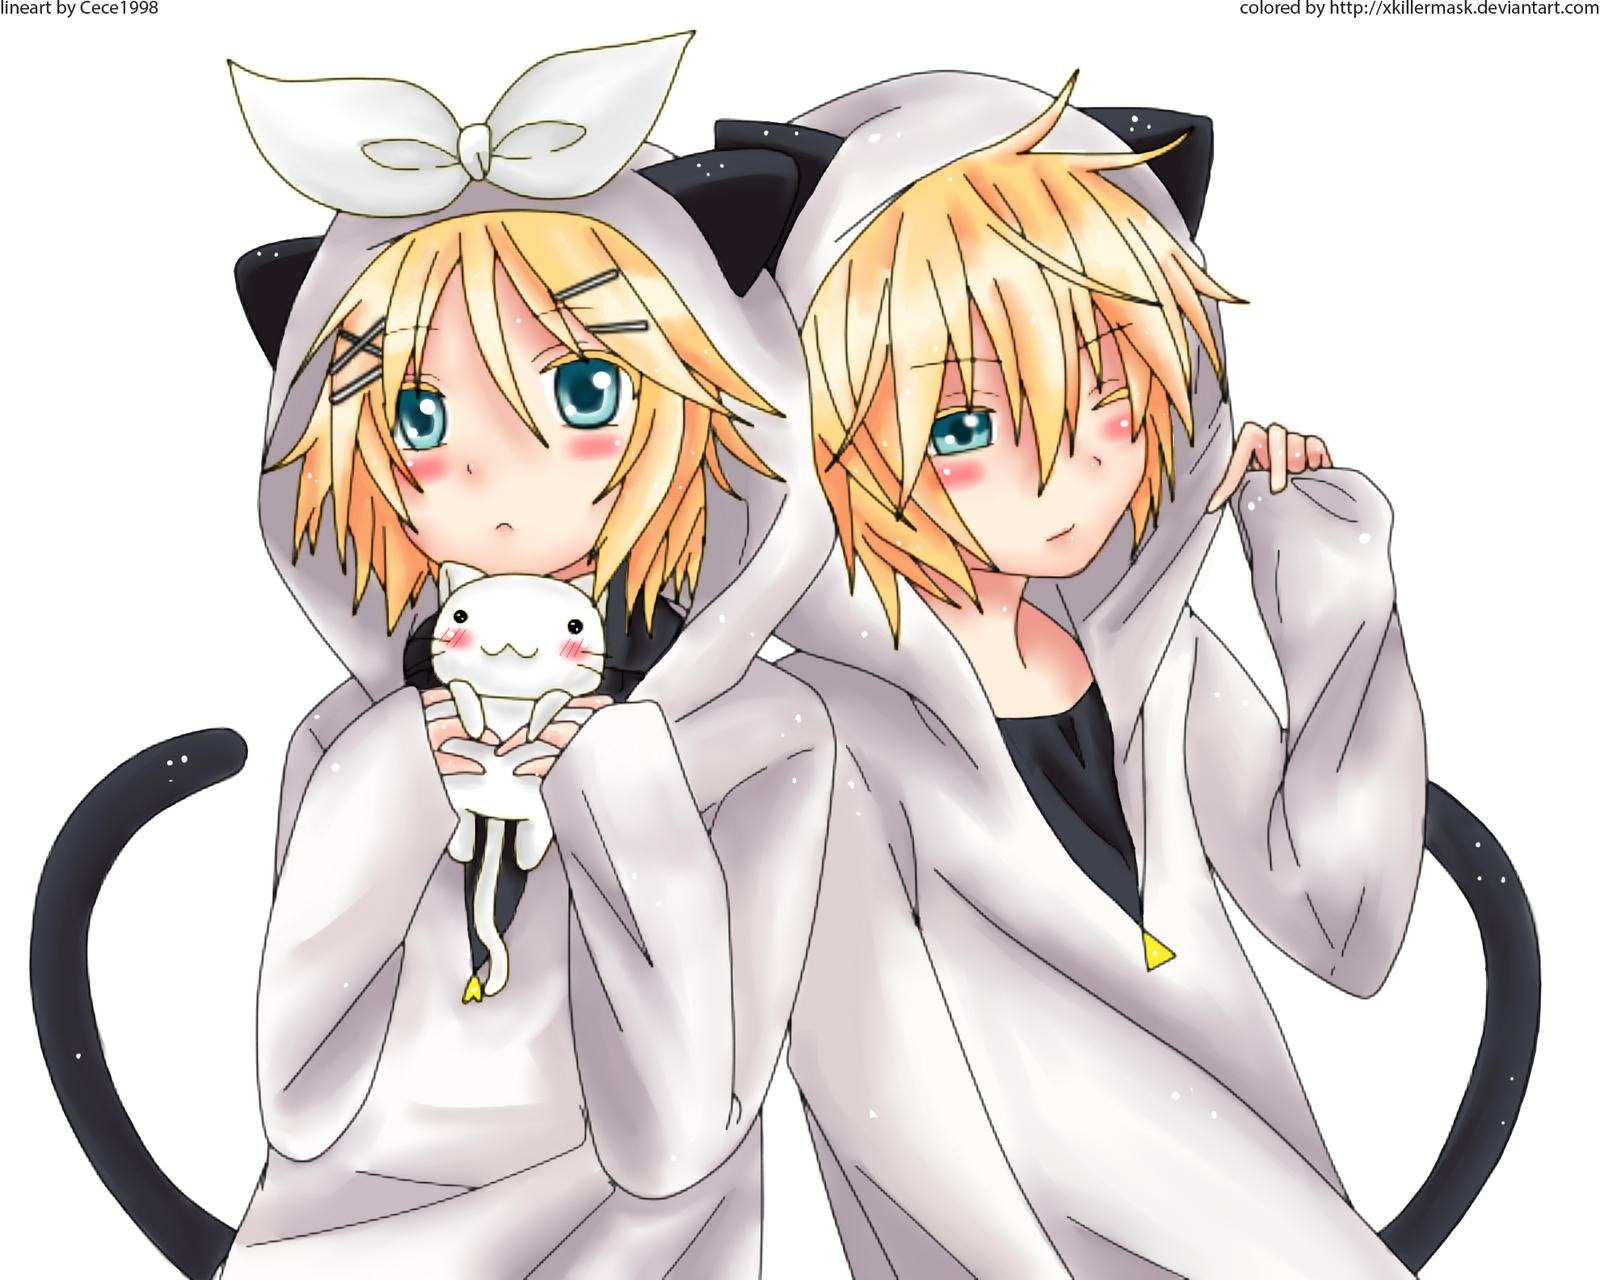 Rin And Len Kagamine Neko Neko by MaskBone on DeviantArt